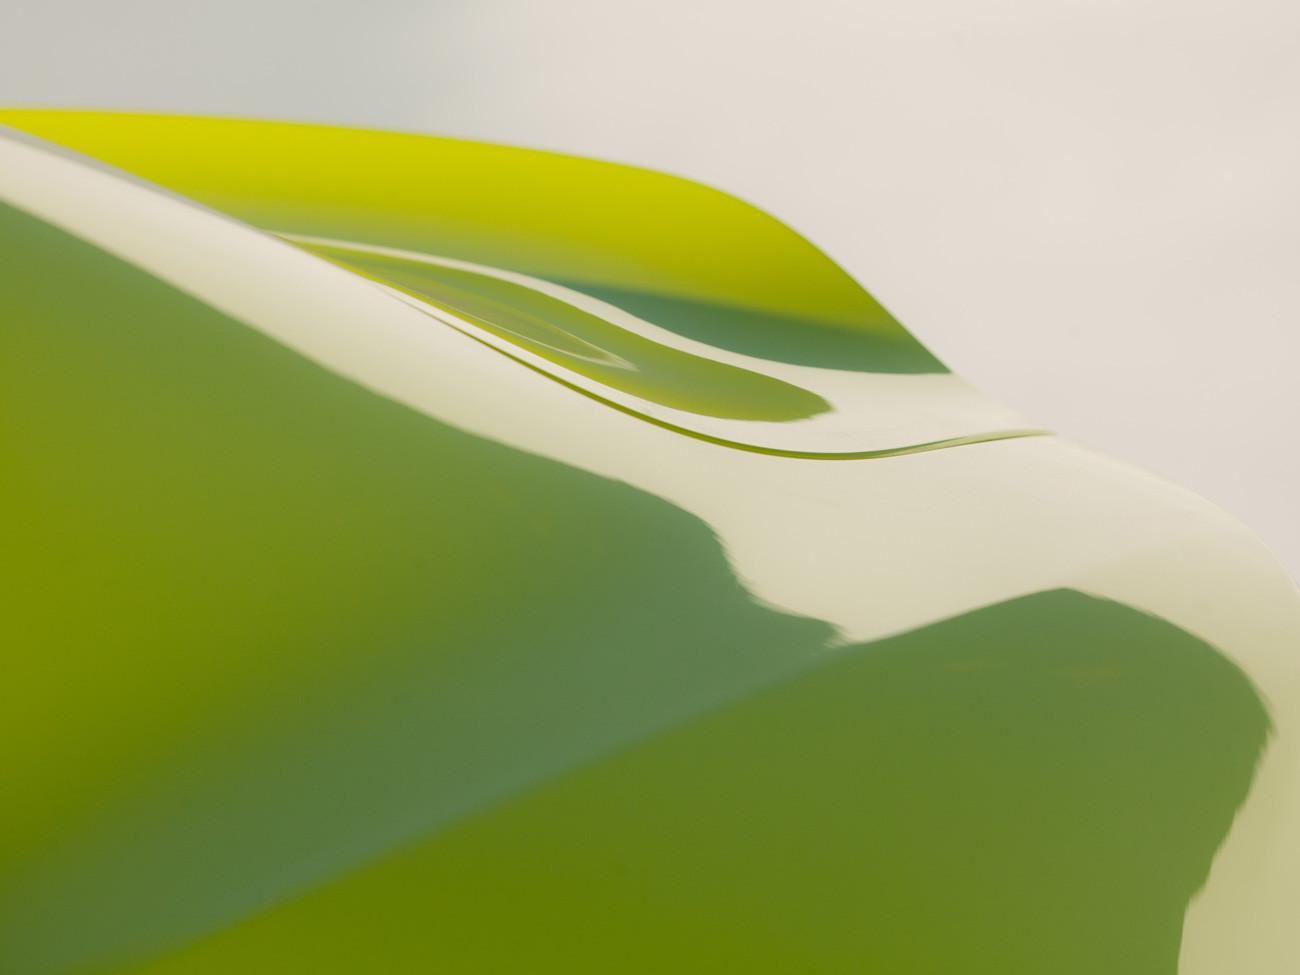 Aston Martin - © Paul Rousteau